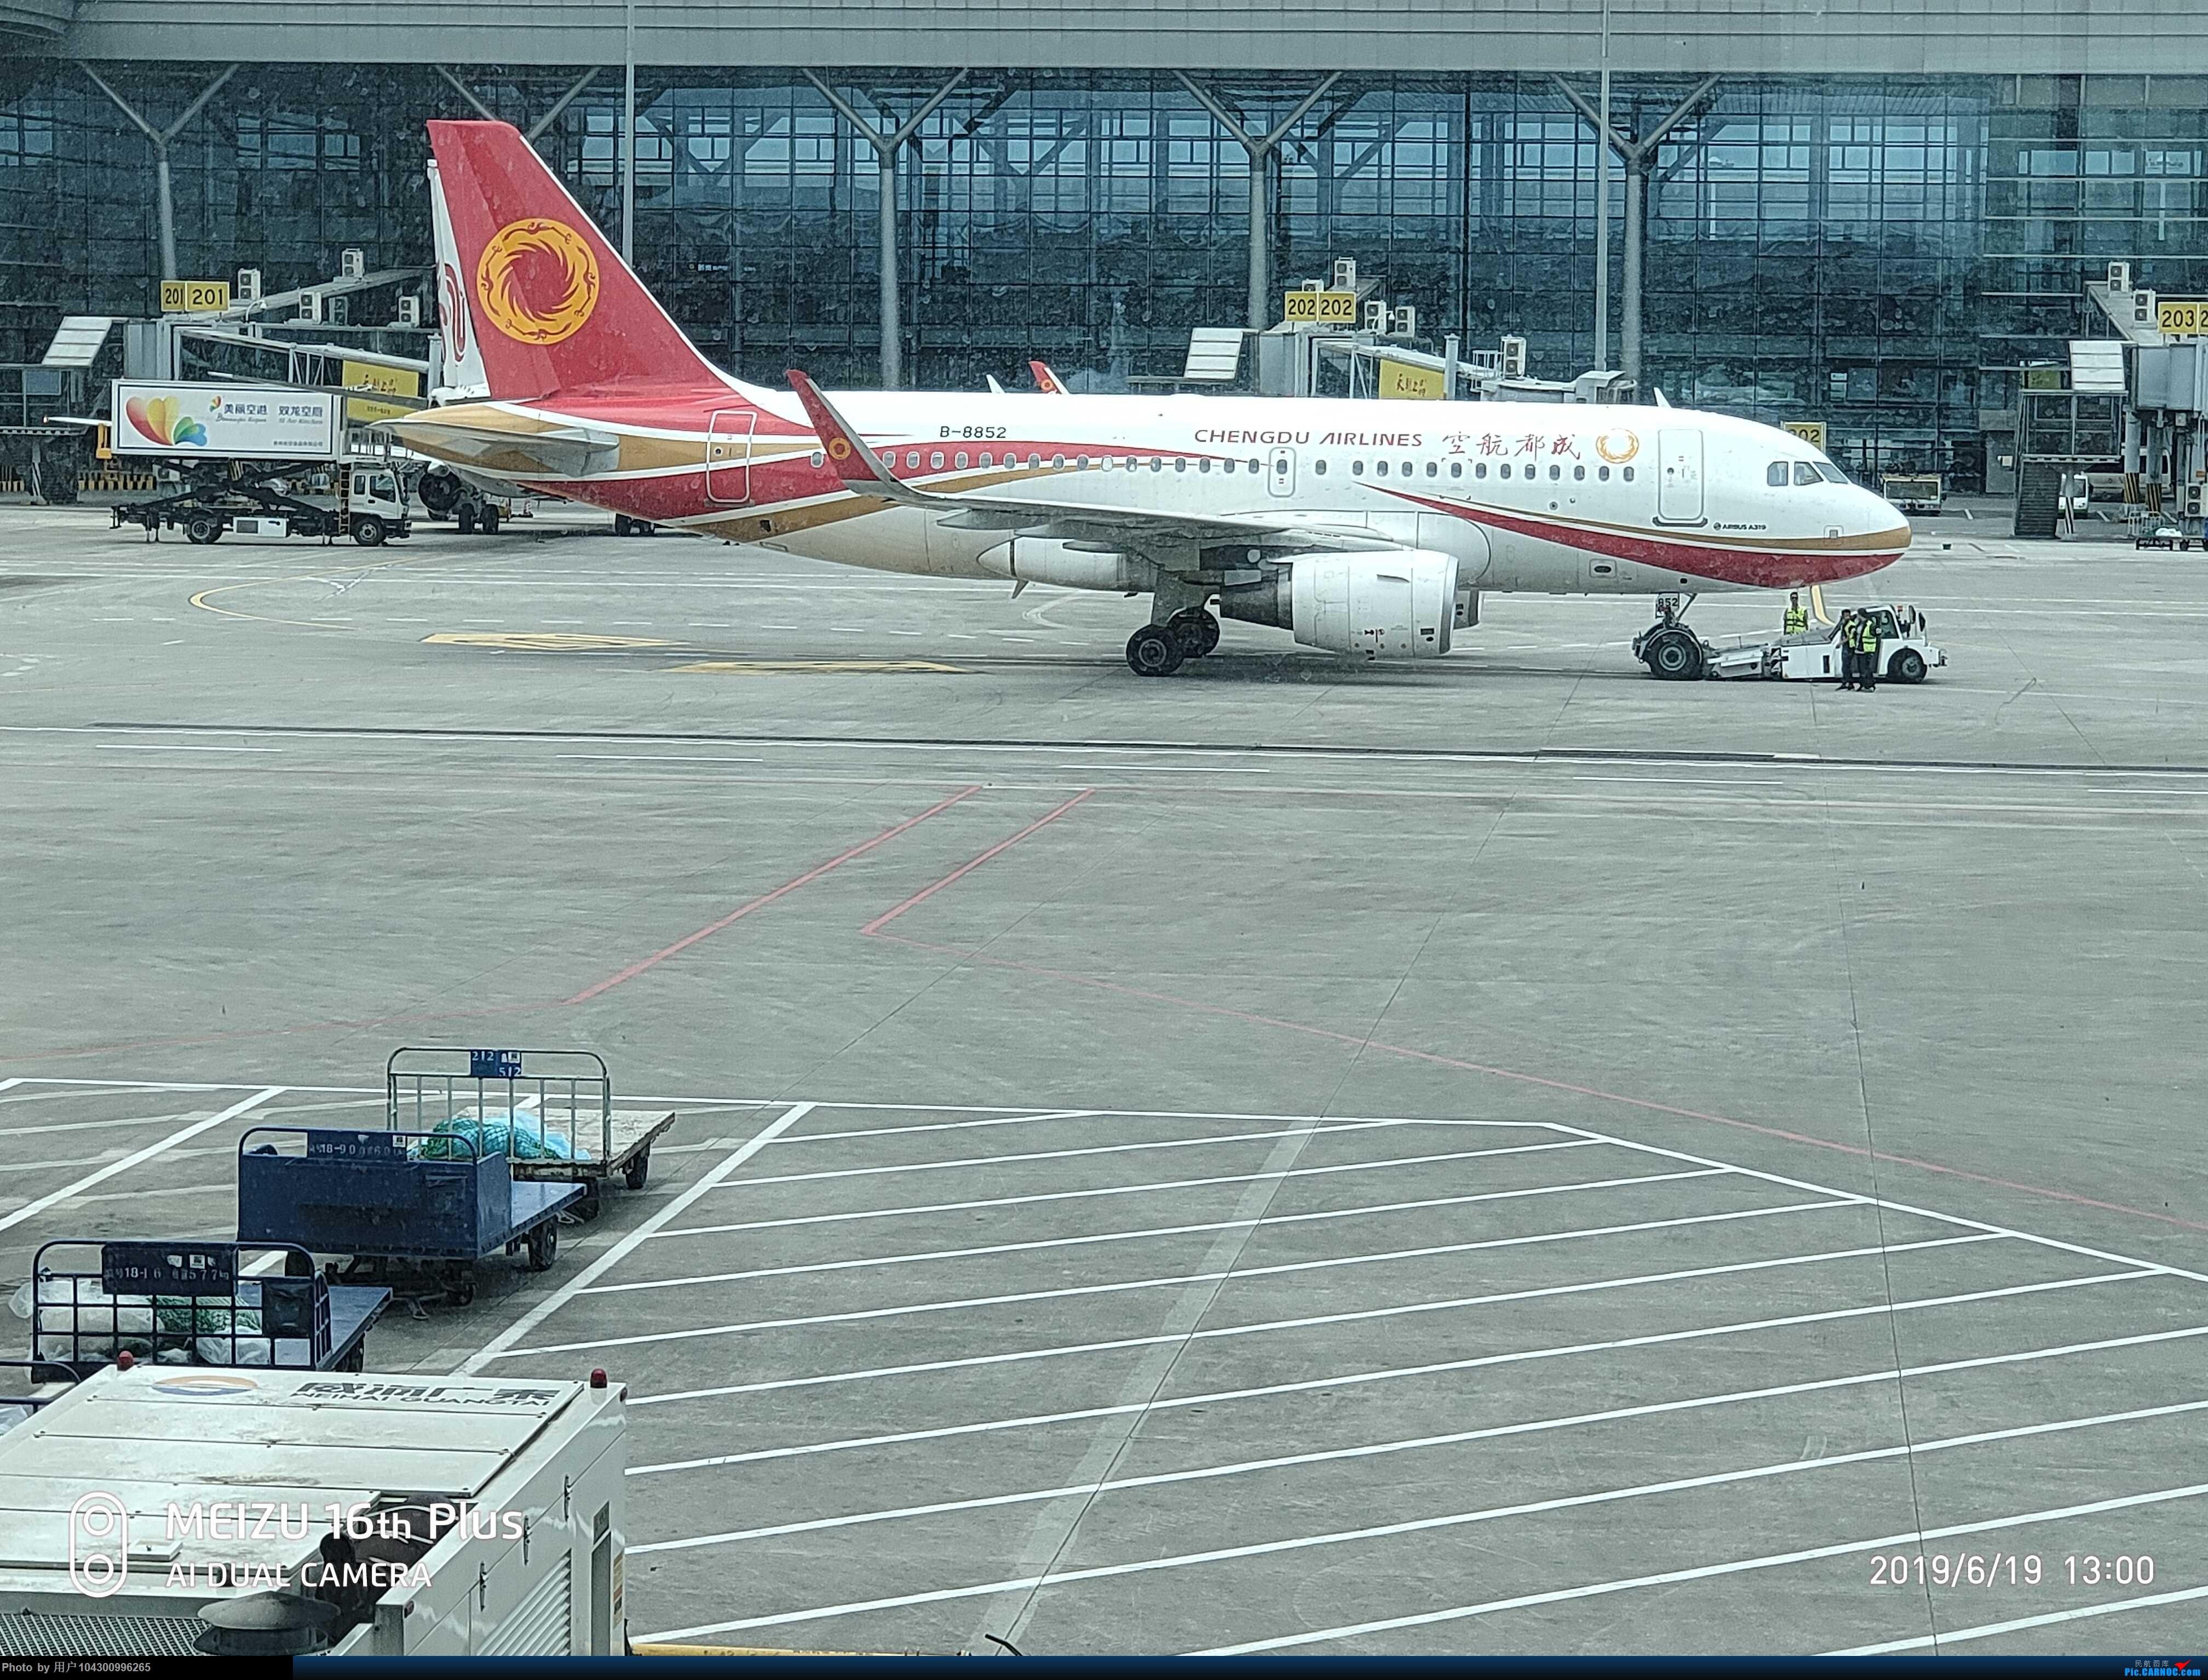 Re:[原创]DM哥飞行游记--贵阳往返荔波2日游 AIRBUS A319-100 B-8852 中国贵阳龙洞堡国际机场